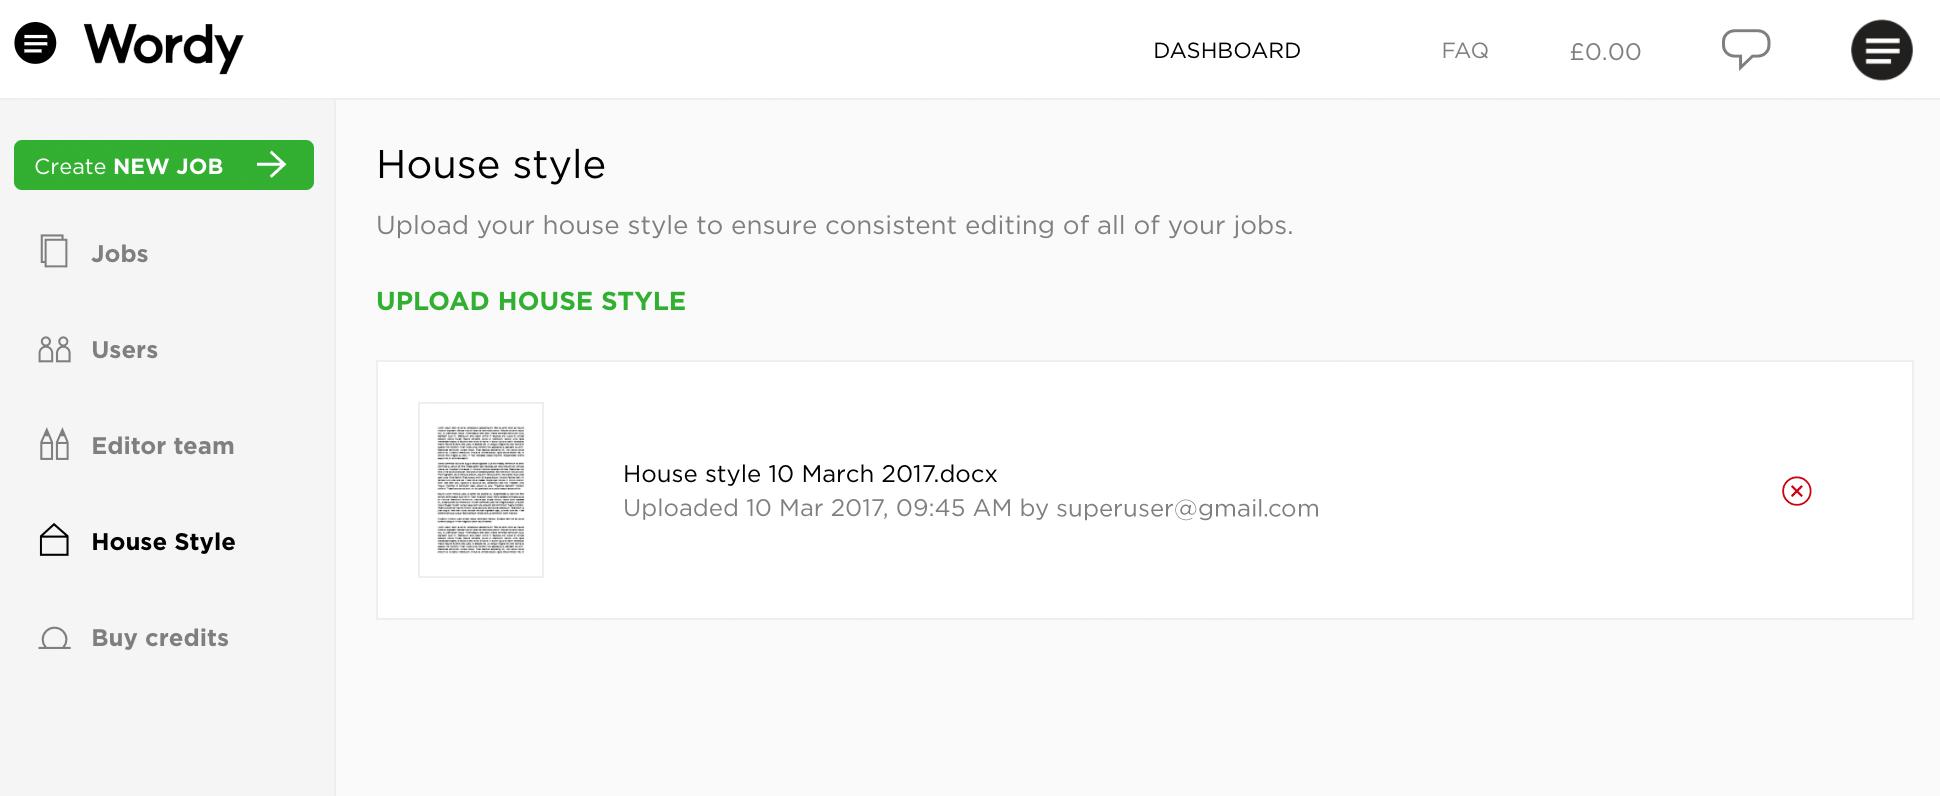 FAQ: House style